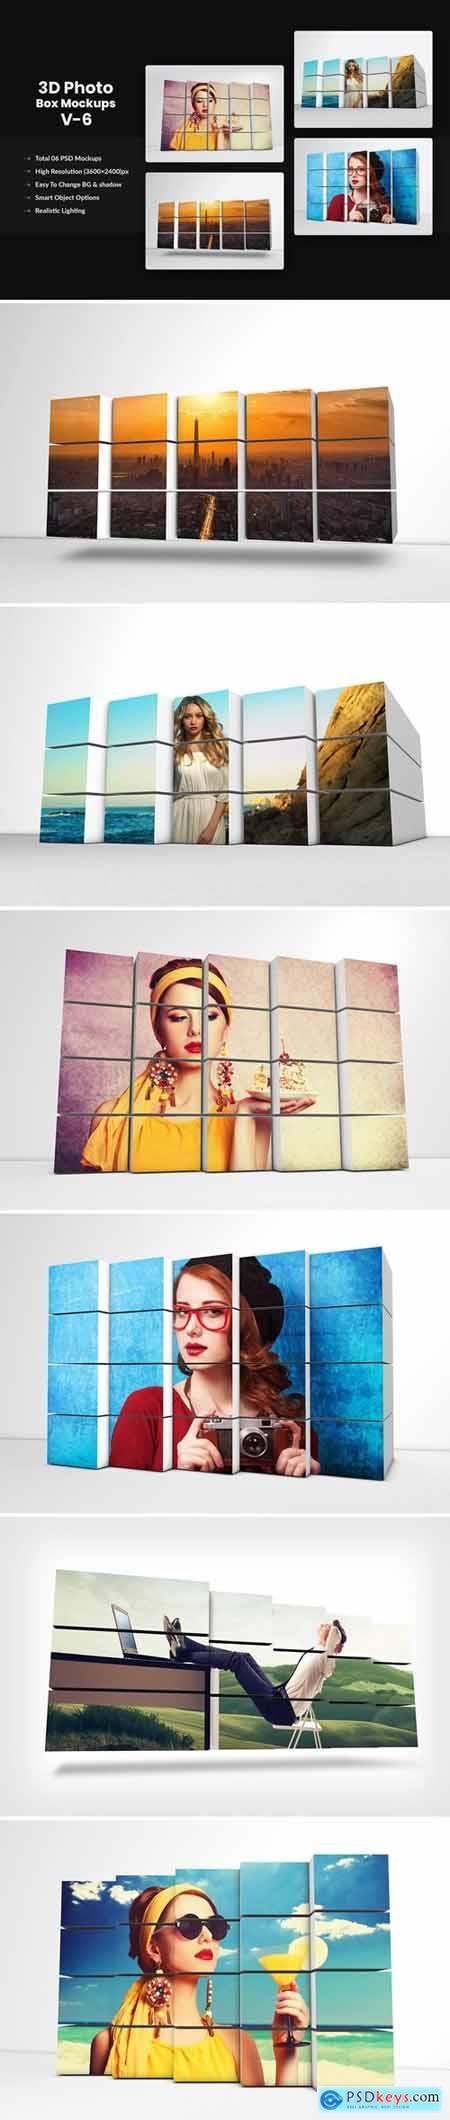 3D Photo Box Mockups Template V-6